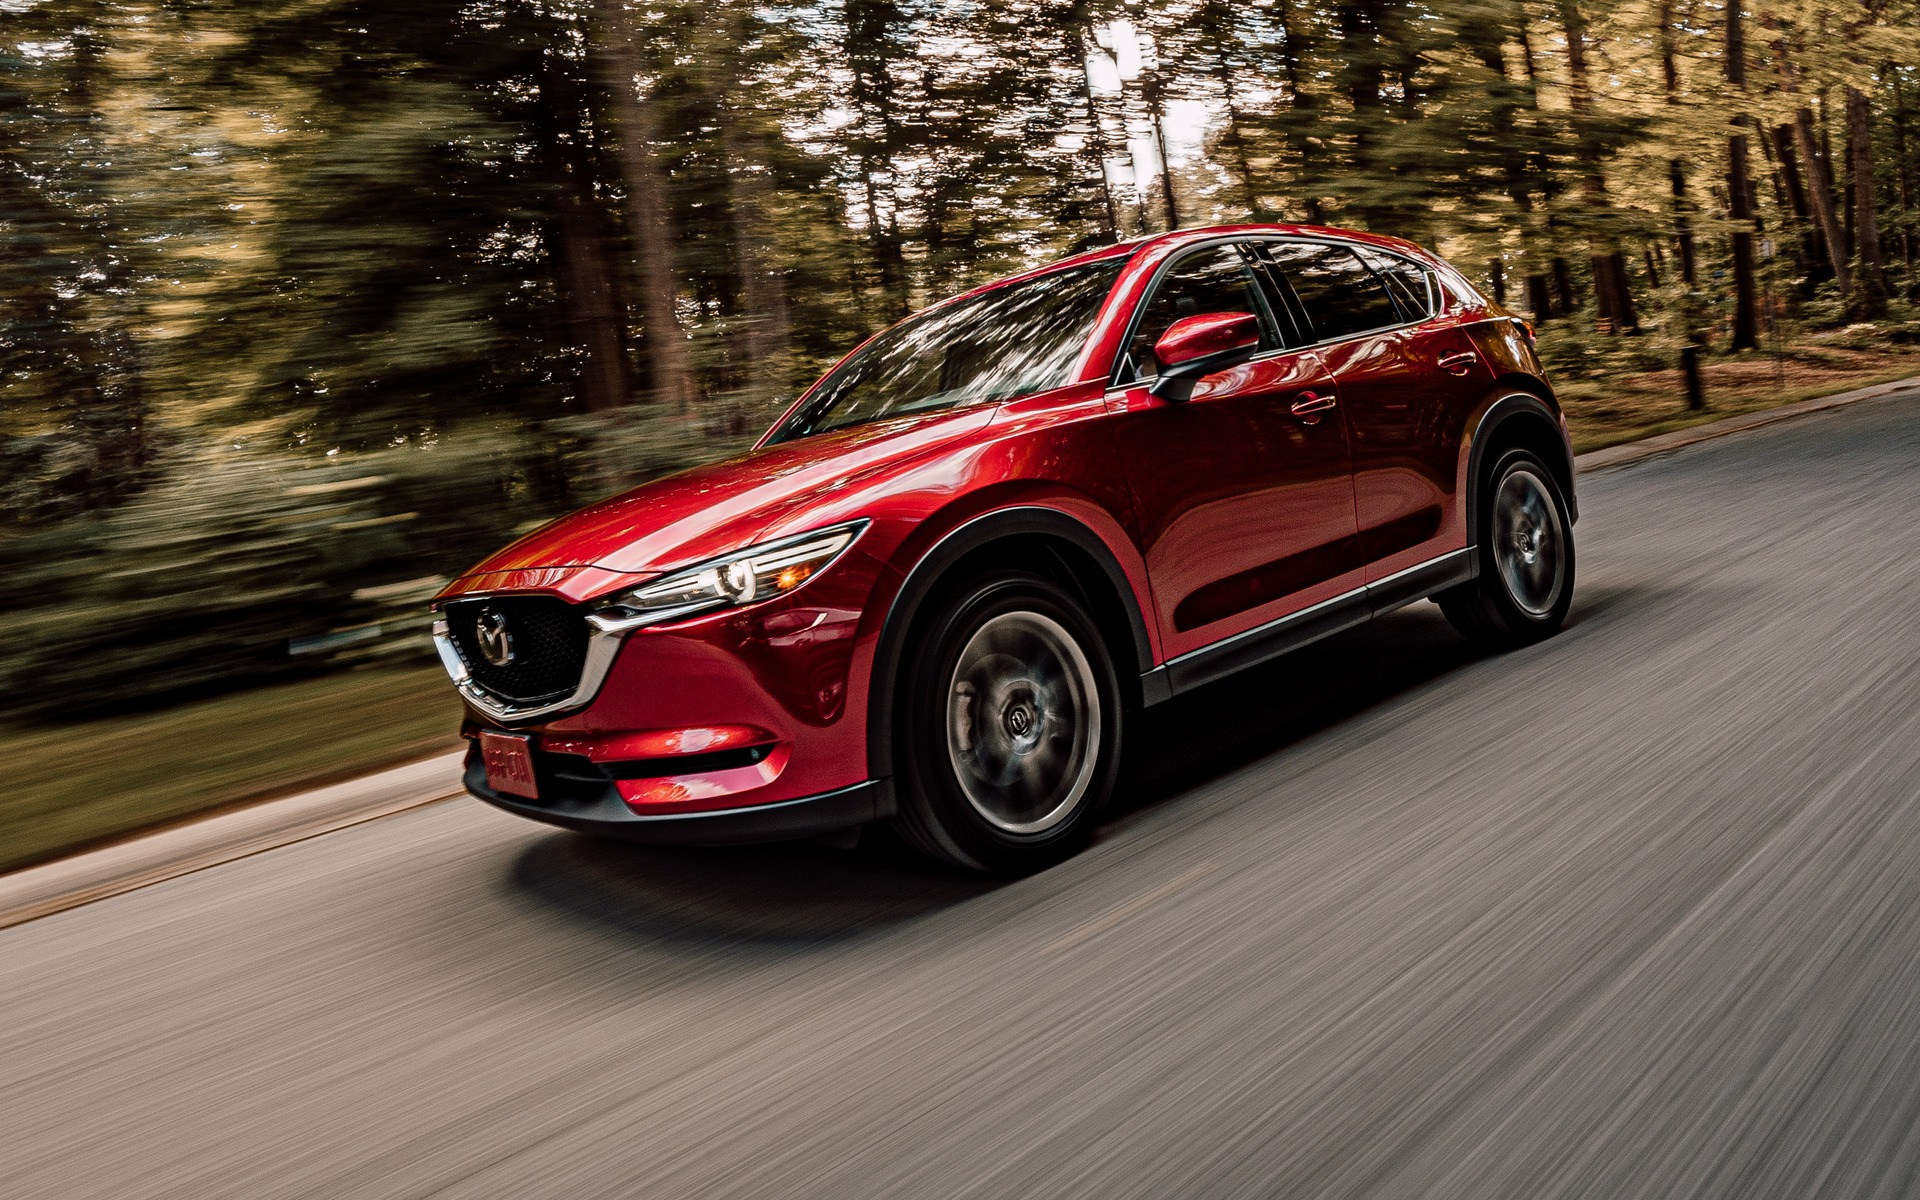 Kekurangan Mazda Cx 5 Perbandingan Harga